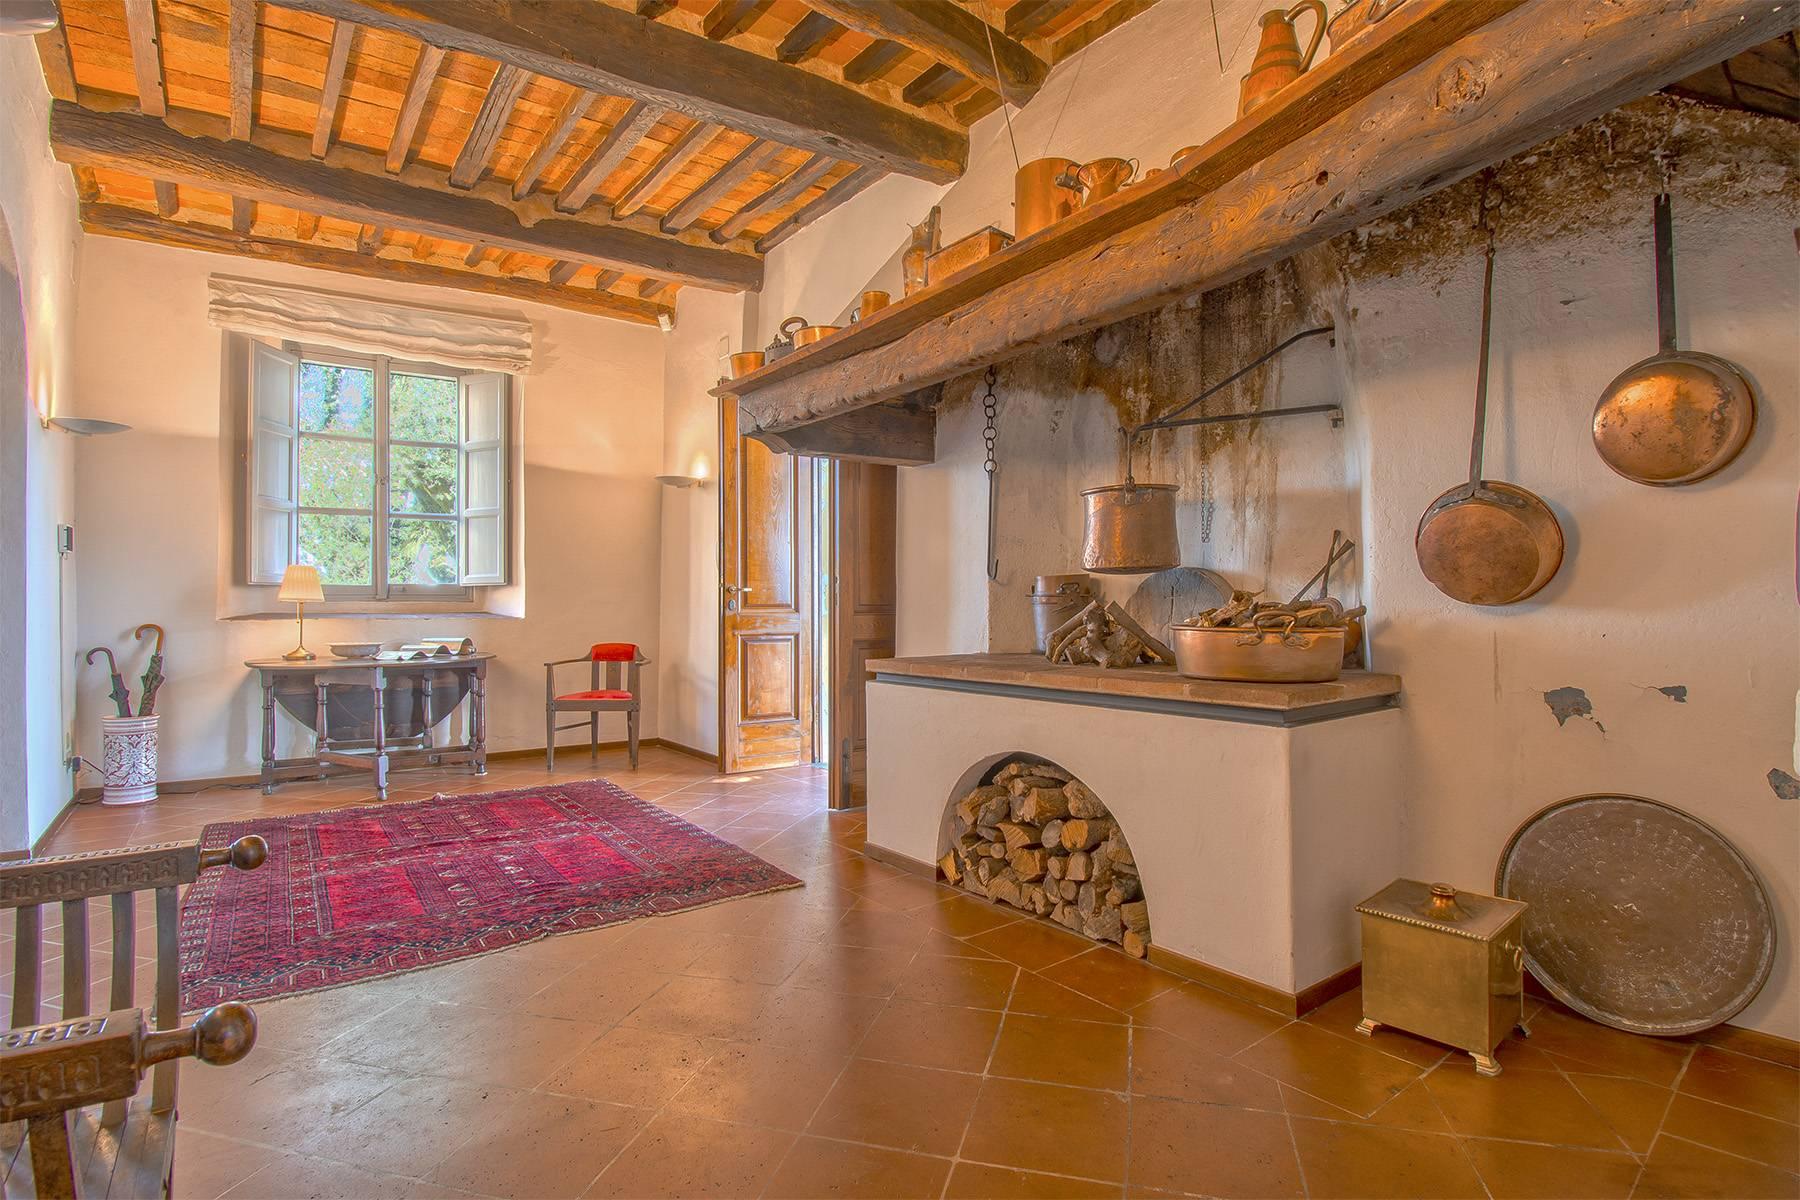 Villa in Vendita a Capannori: 5 locali, 380 mq - Foto 13